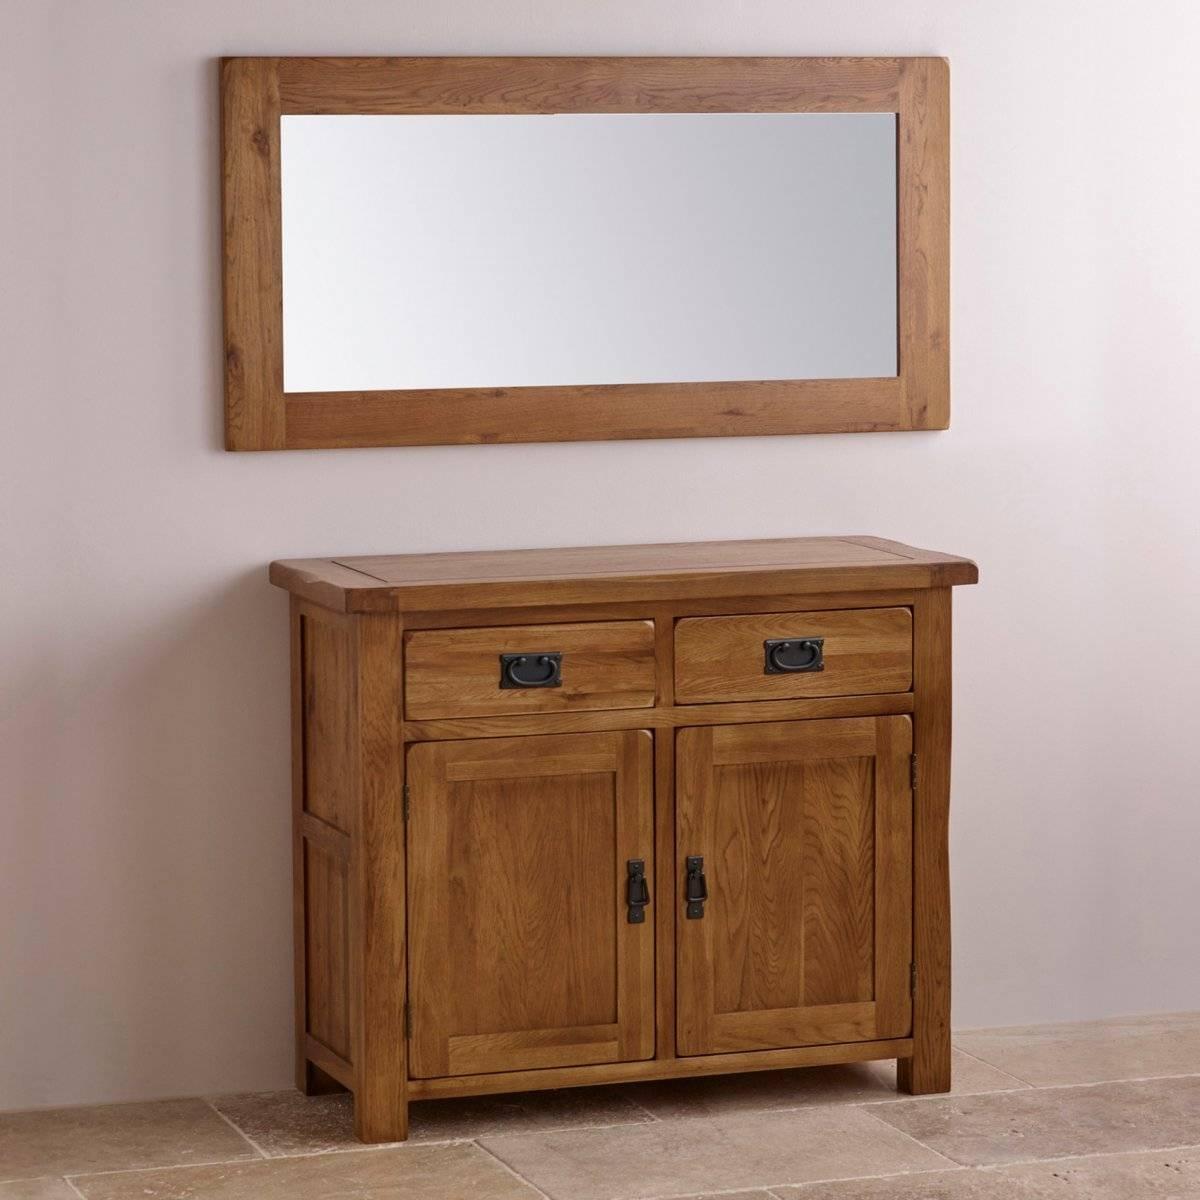 Original Rustic Wall Mirror In Solid Oak | Oak Furniture Land for Oak Wall Mirrors (Image 8 of 15)